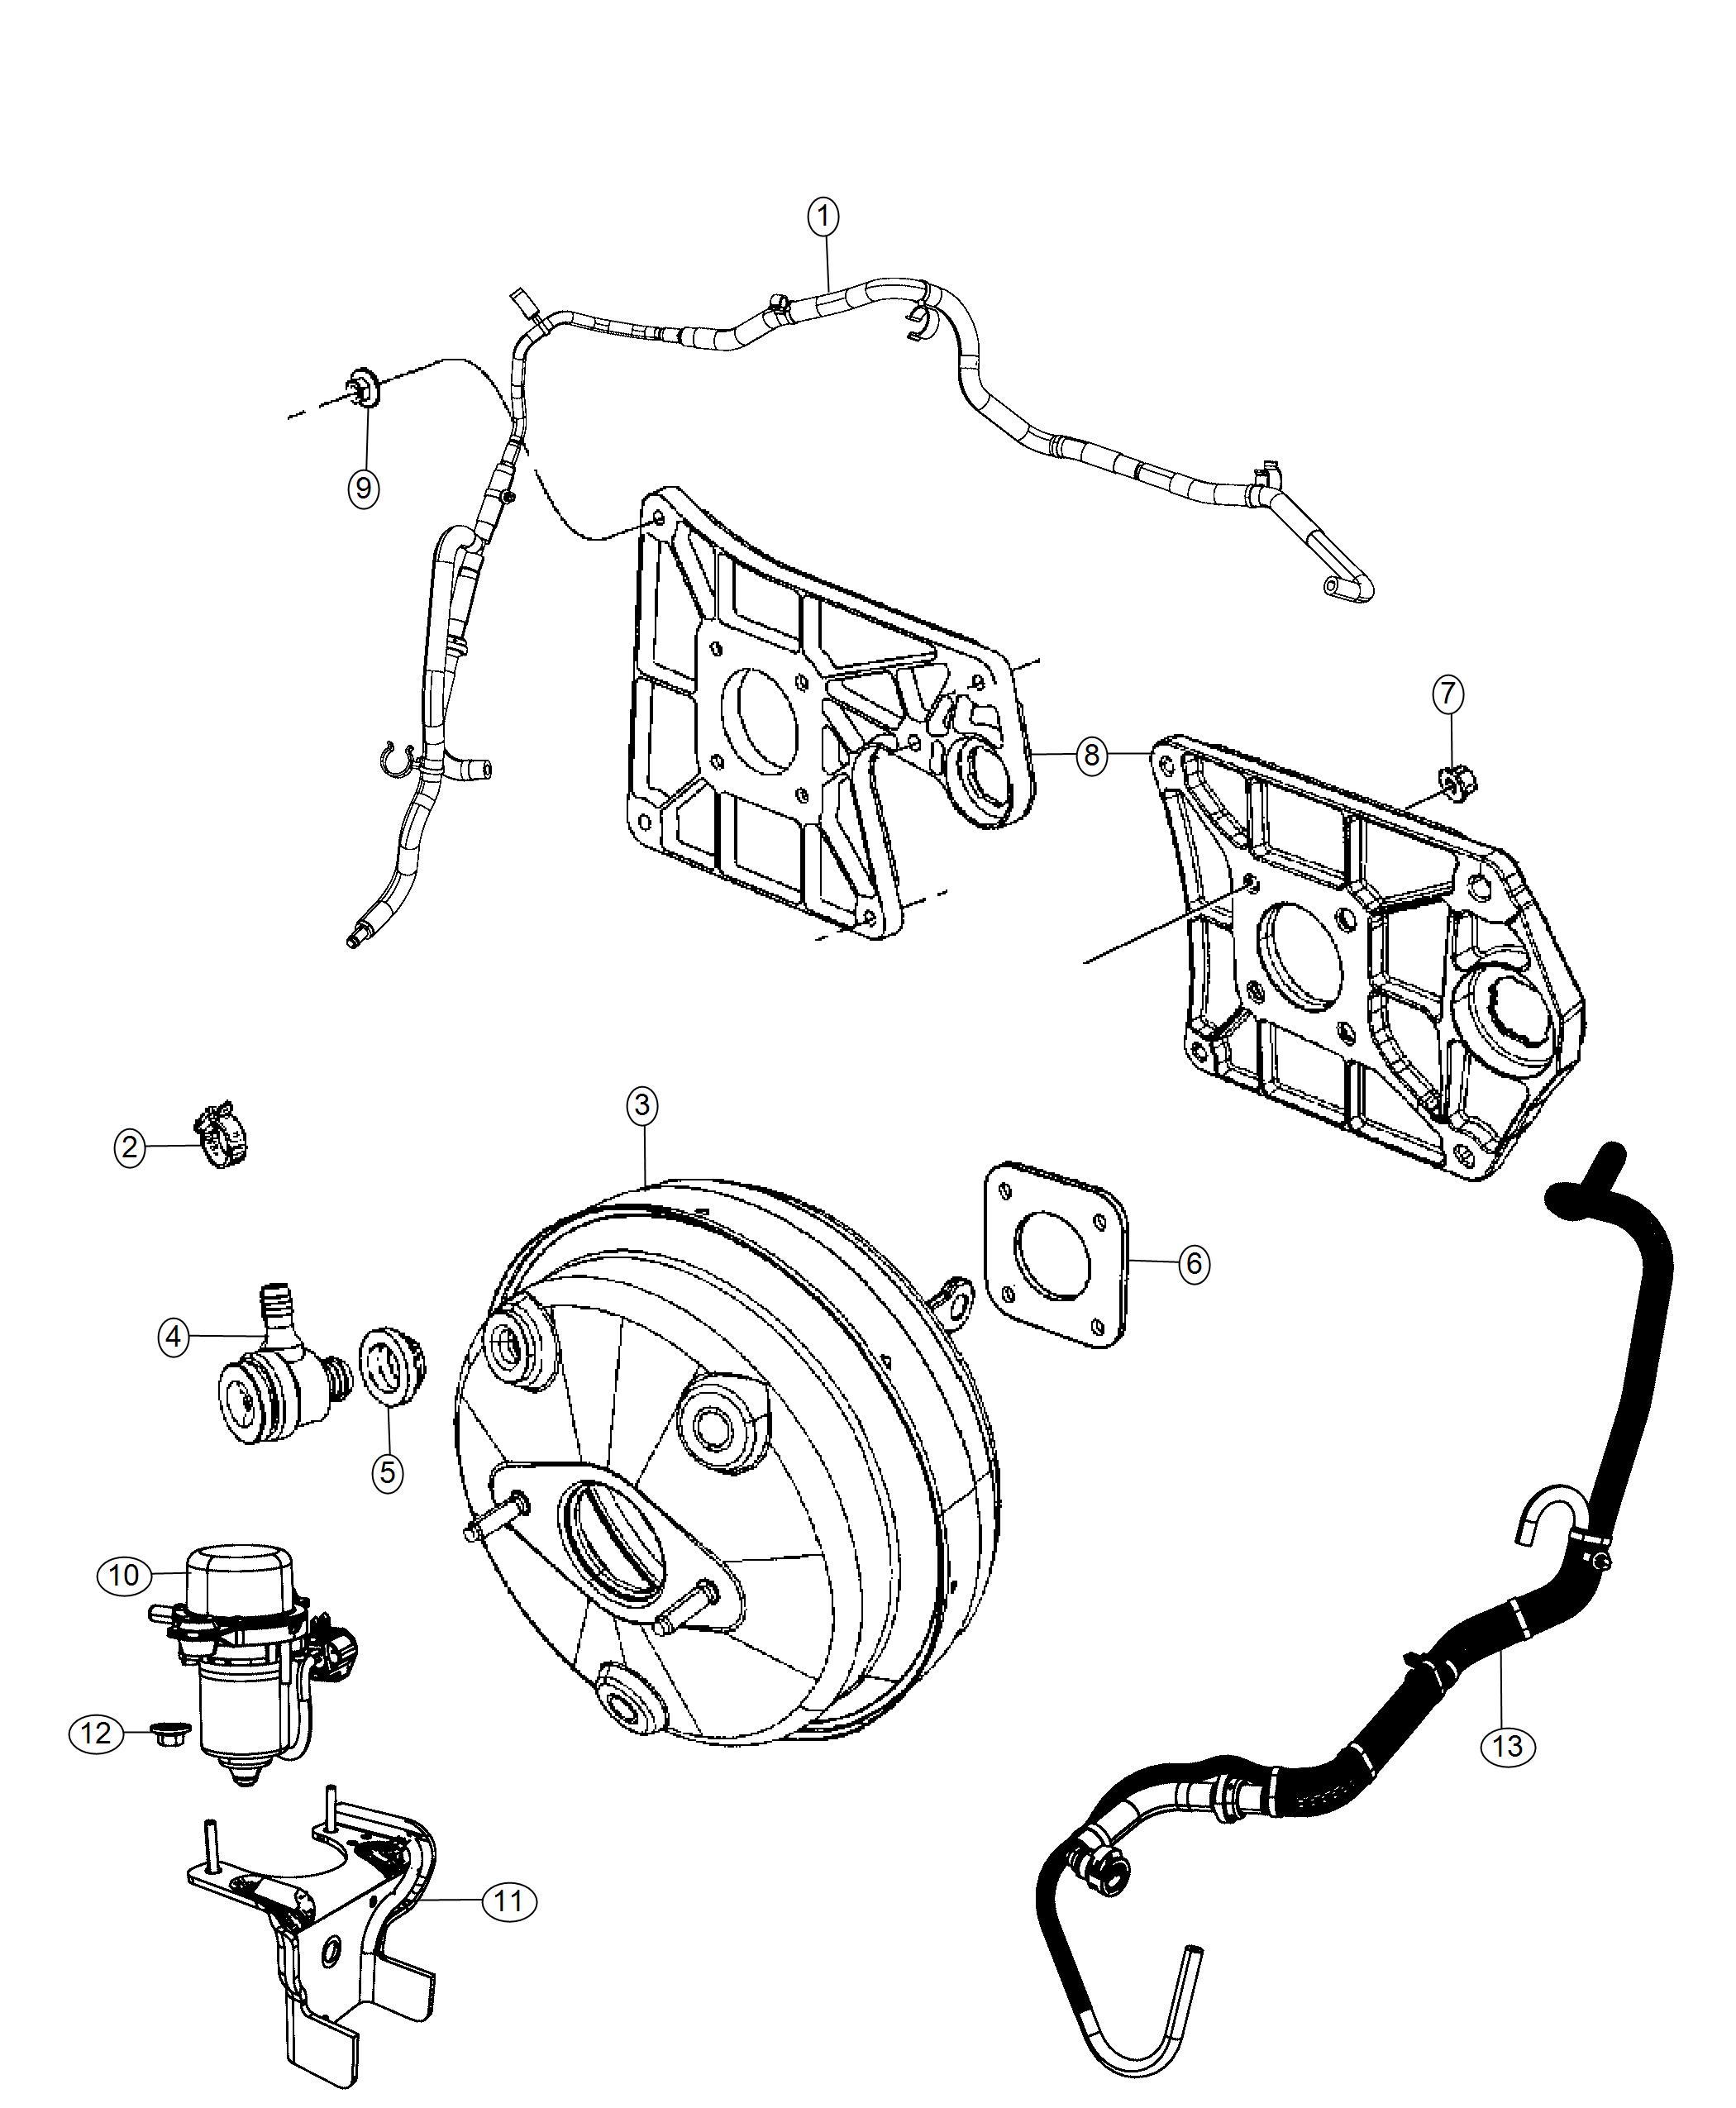 Jeep Wrangler Pump. Air. [3.6l v6 vvt engine]. Brake